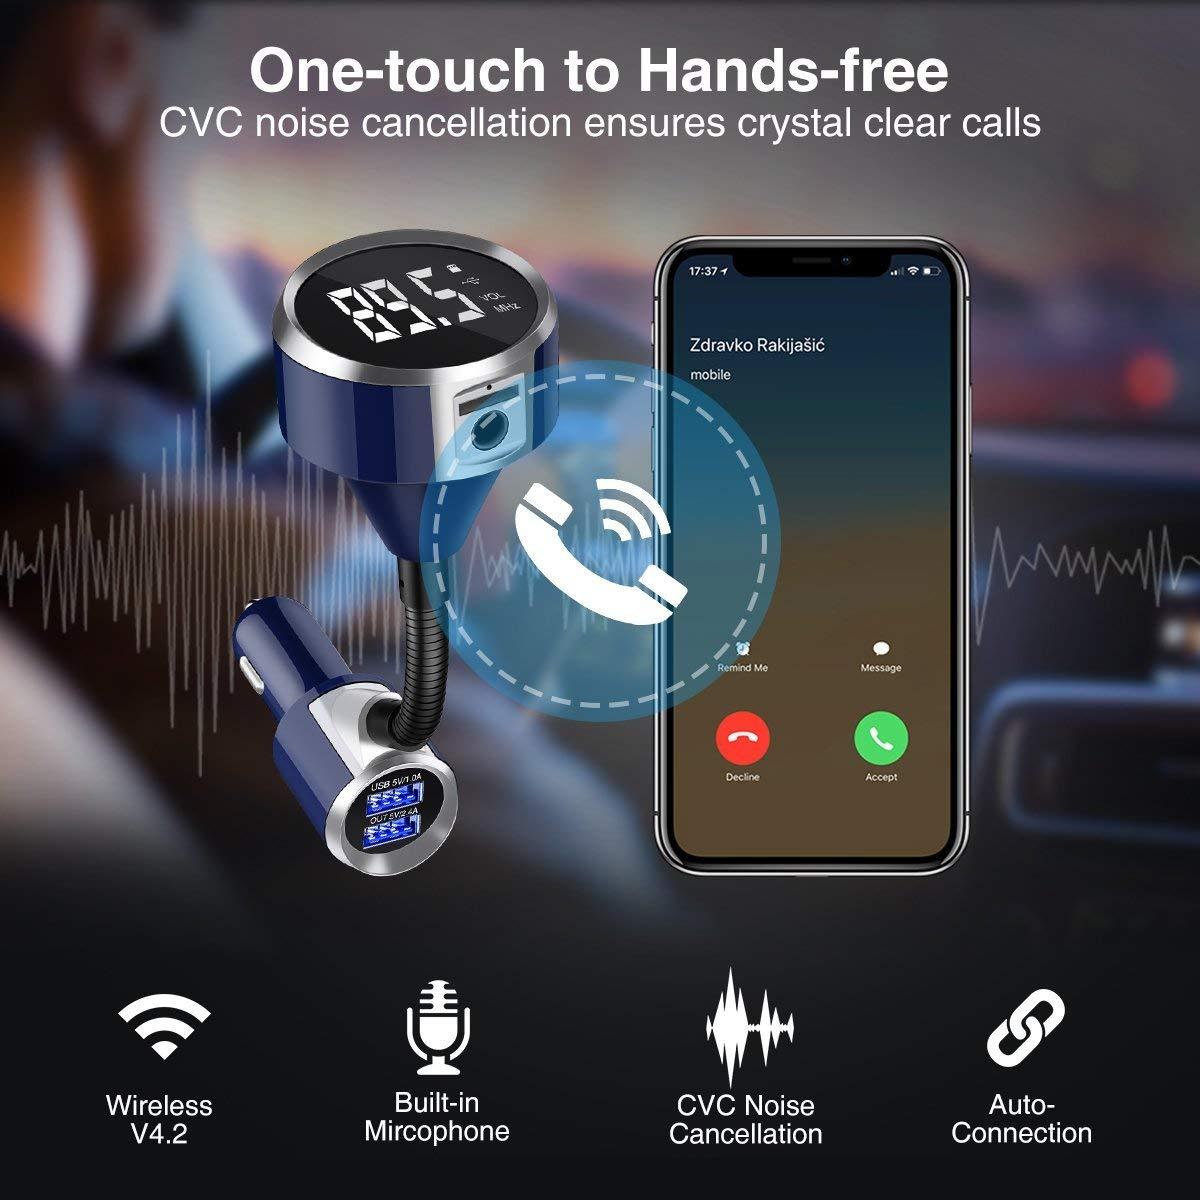 KFZ Auto Radio Adapter drahtlose Bluetooth Freisprechen mit 2 USB Anschlusse Hands-Free LCD Audio USB TF Karte MP3 1,4-Zoll-Display f/ür iPhone 8 Samsung S8 usw ELEGIANT Bluetooth FM Transmitter